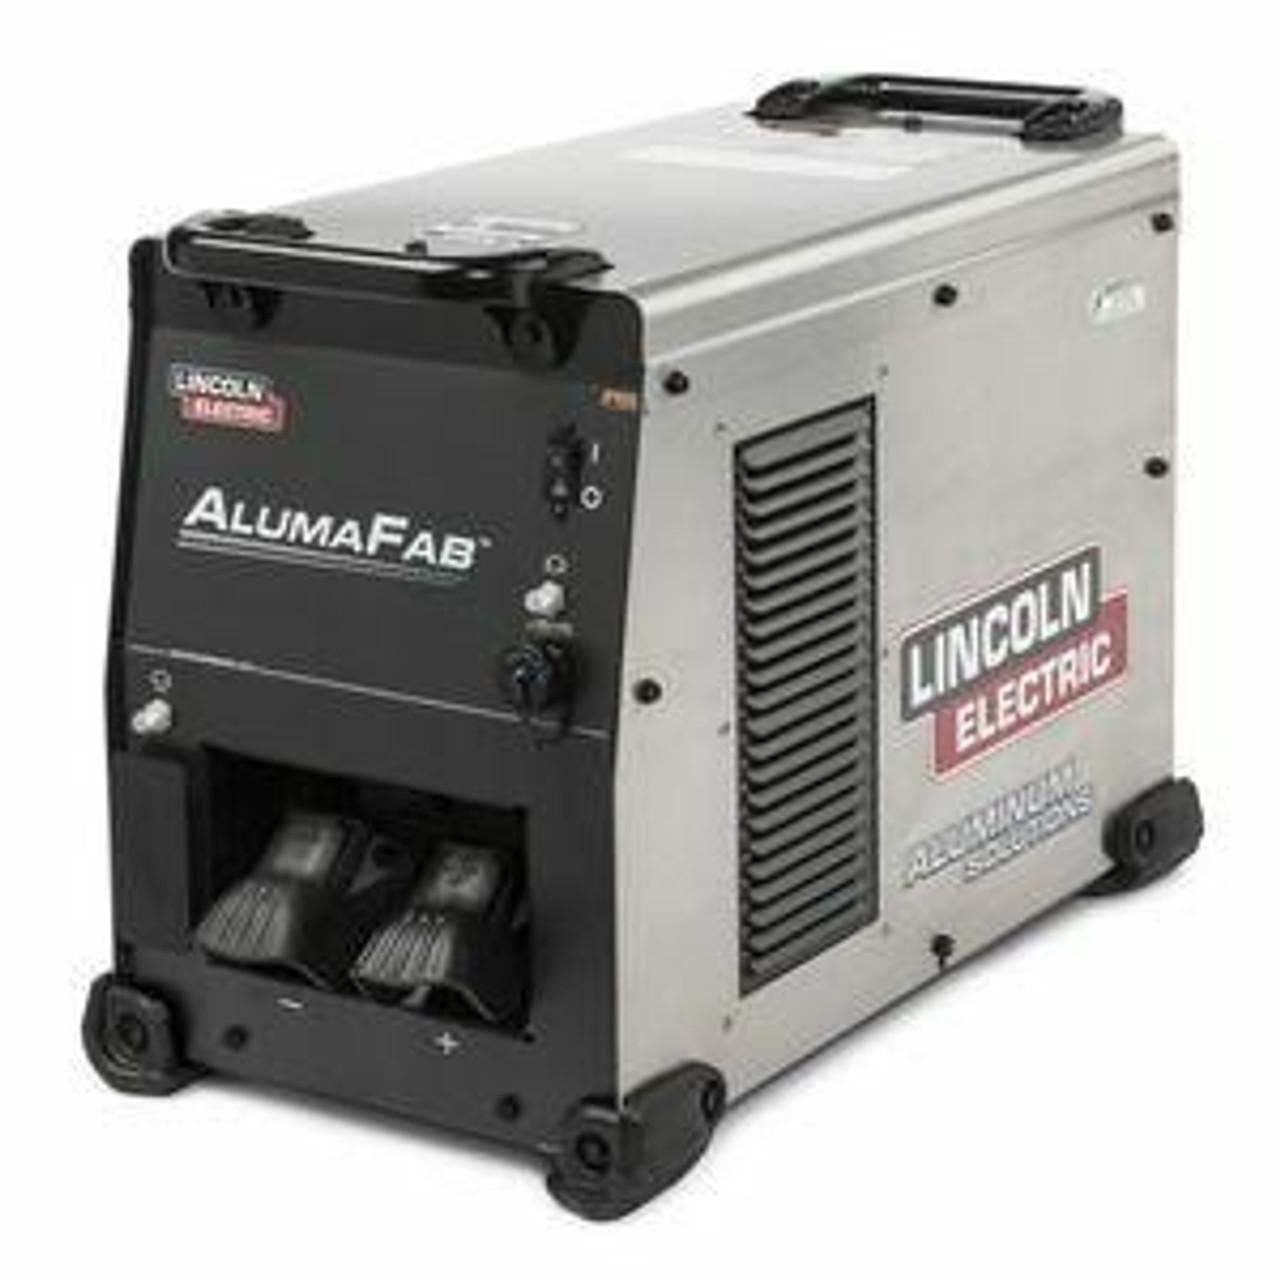 Lincoln Electric Lincoln Electric ALUMAFAB MULTI-PROCESS WELDER - K4189-1